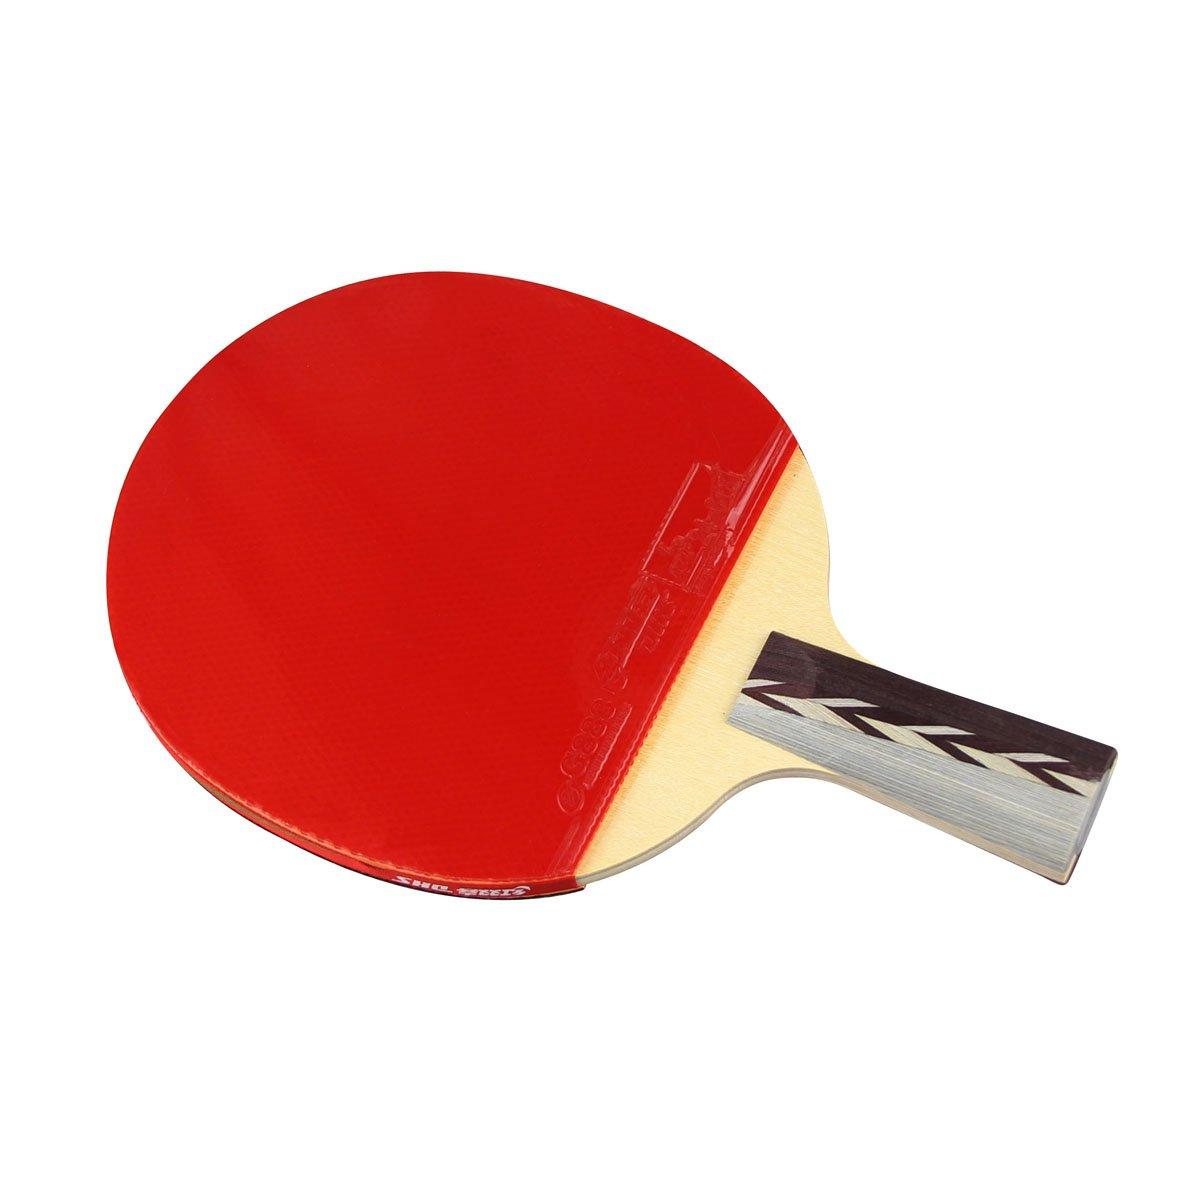 DHS 4006 4-Star Table Tennis Racket (Penhold)   B003VUUN26